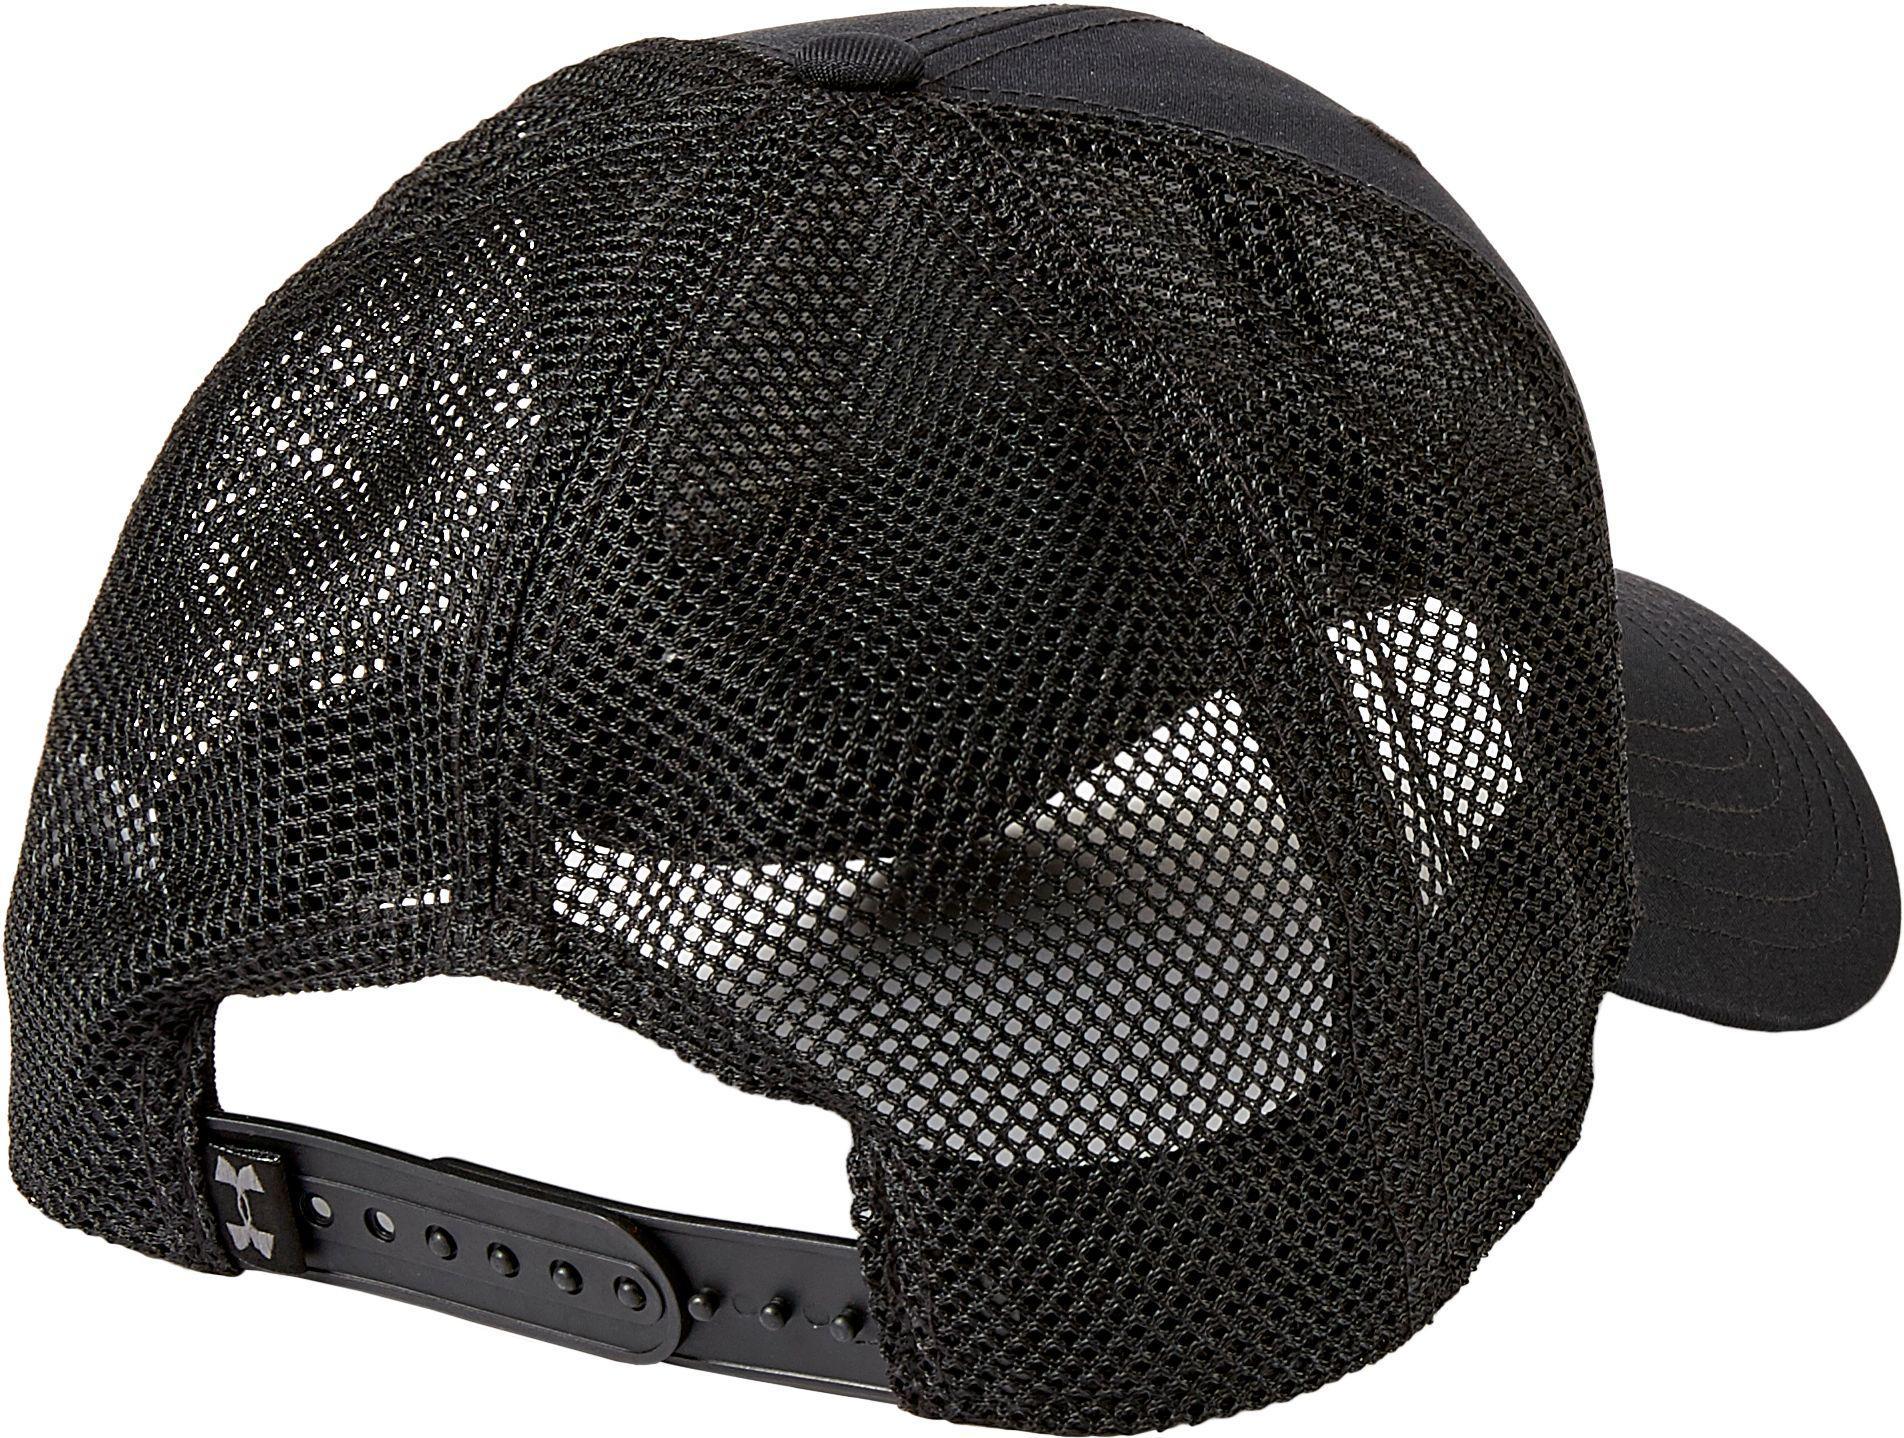 Lyst - Under Armour Project Rock Trucker Hat in Black for Men 1e309a6dd9b